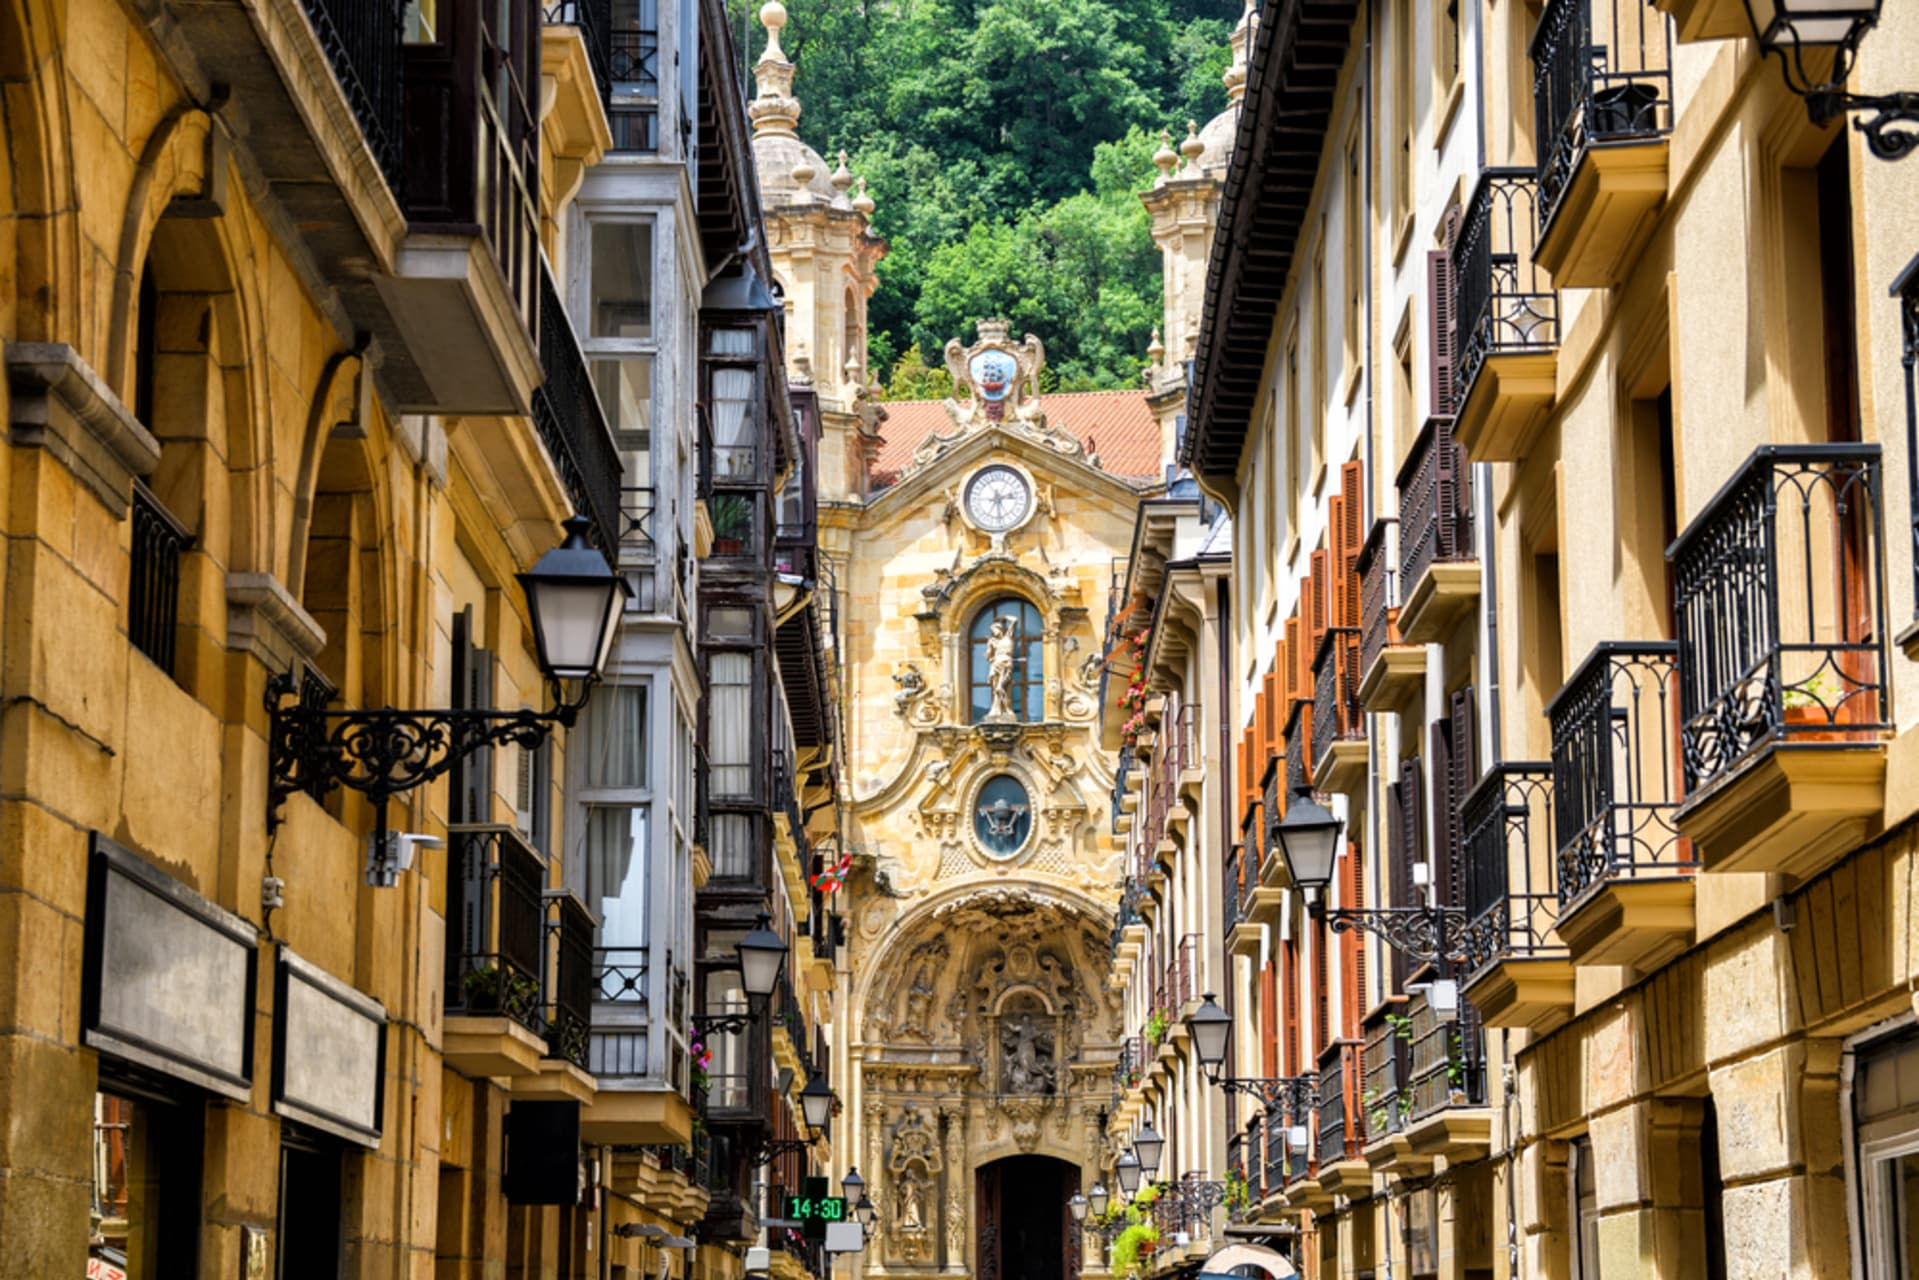 San Sebastian - San Sebastian, The jewel of the Basque Country